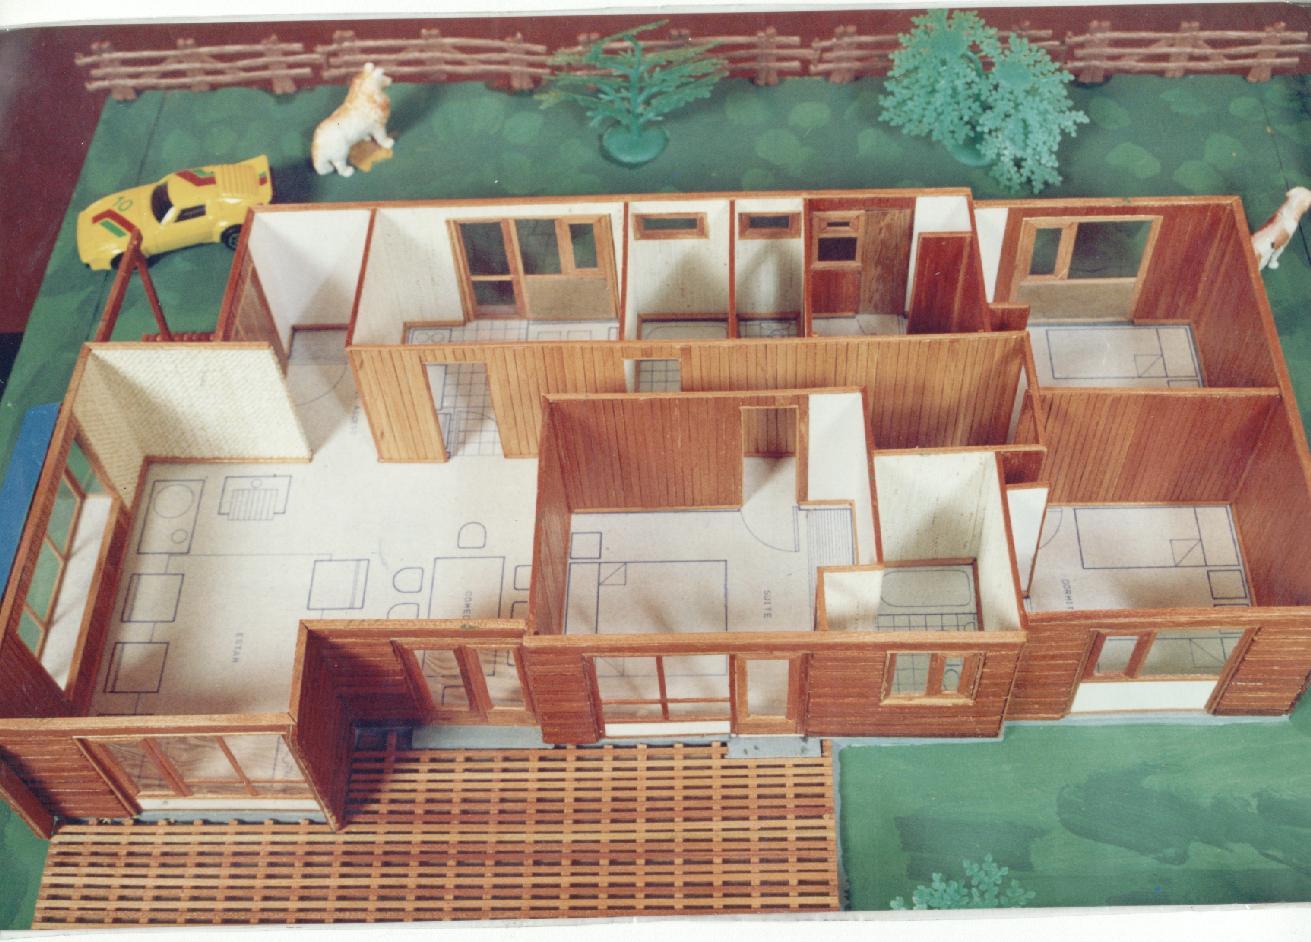 Planos De Casas Modelos Y Disenos De Casas Planos De Casa Para